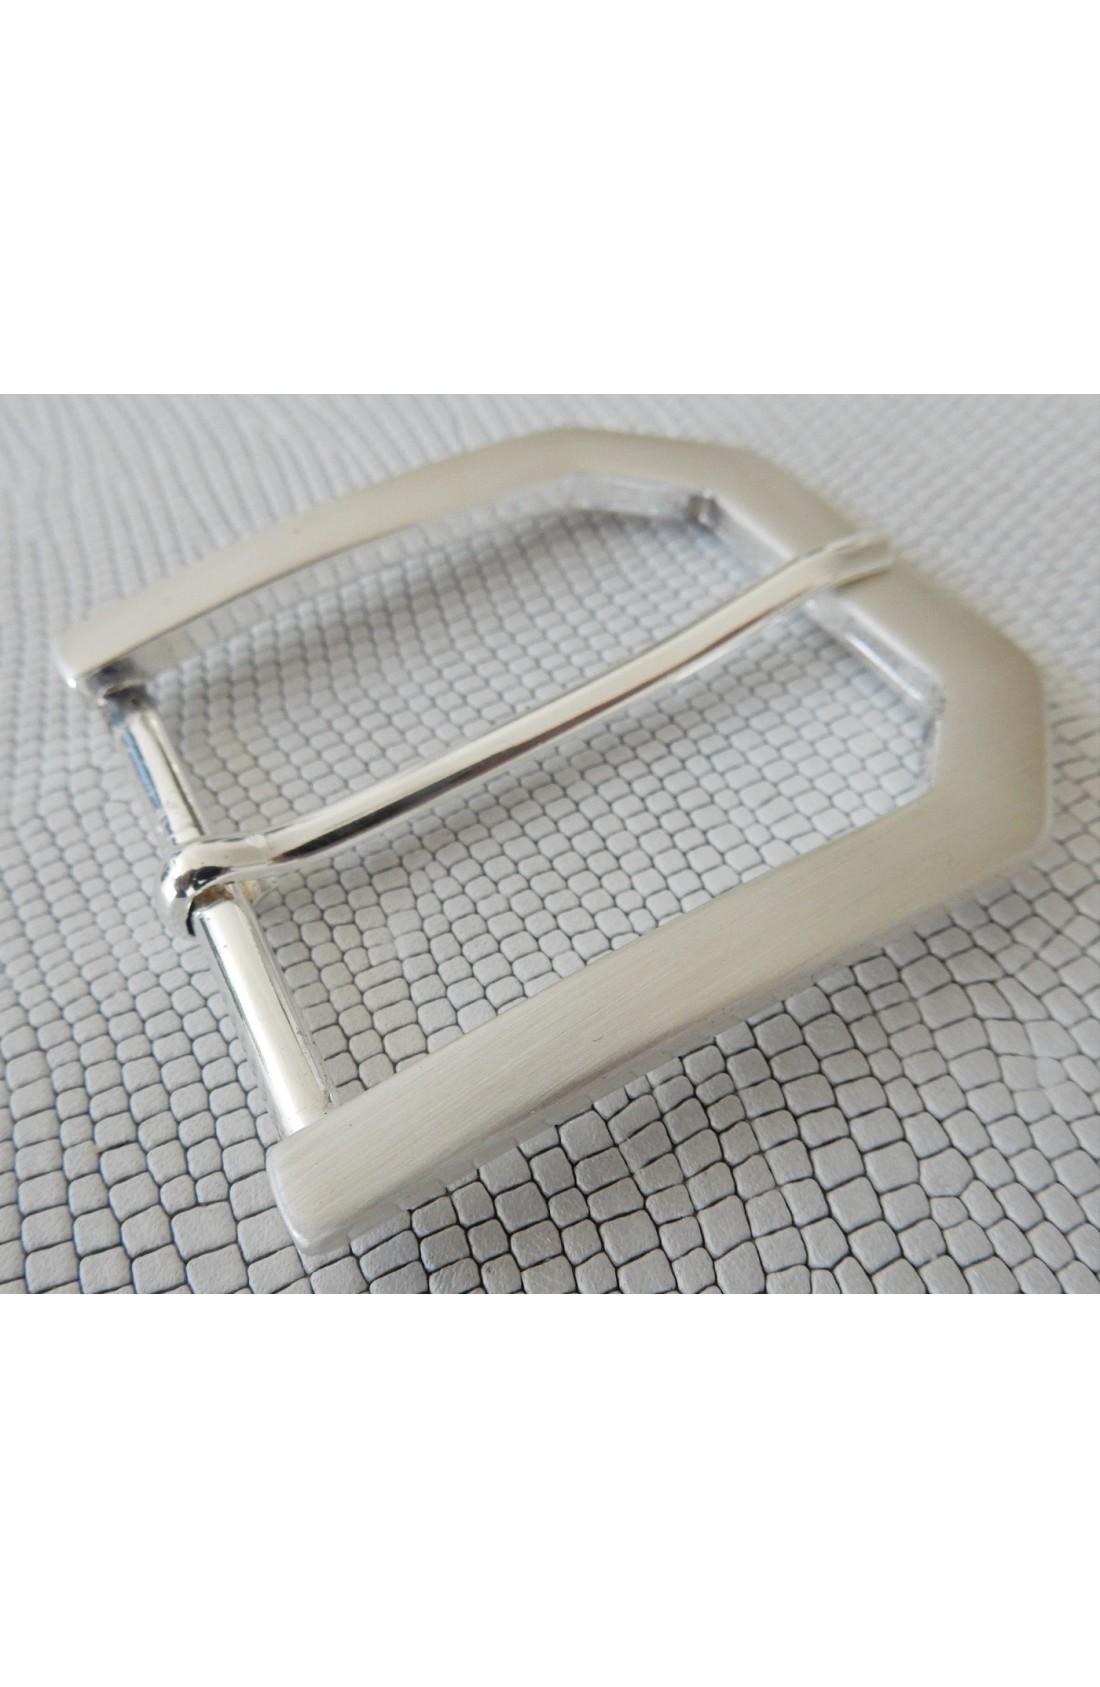 Fibbia Standard Z 48 mm.40 argento satinato (2)